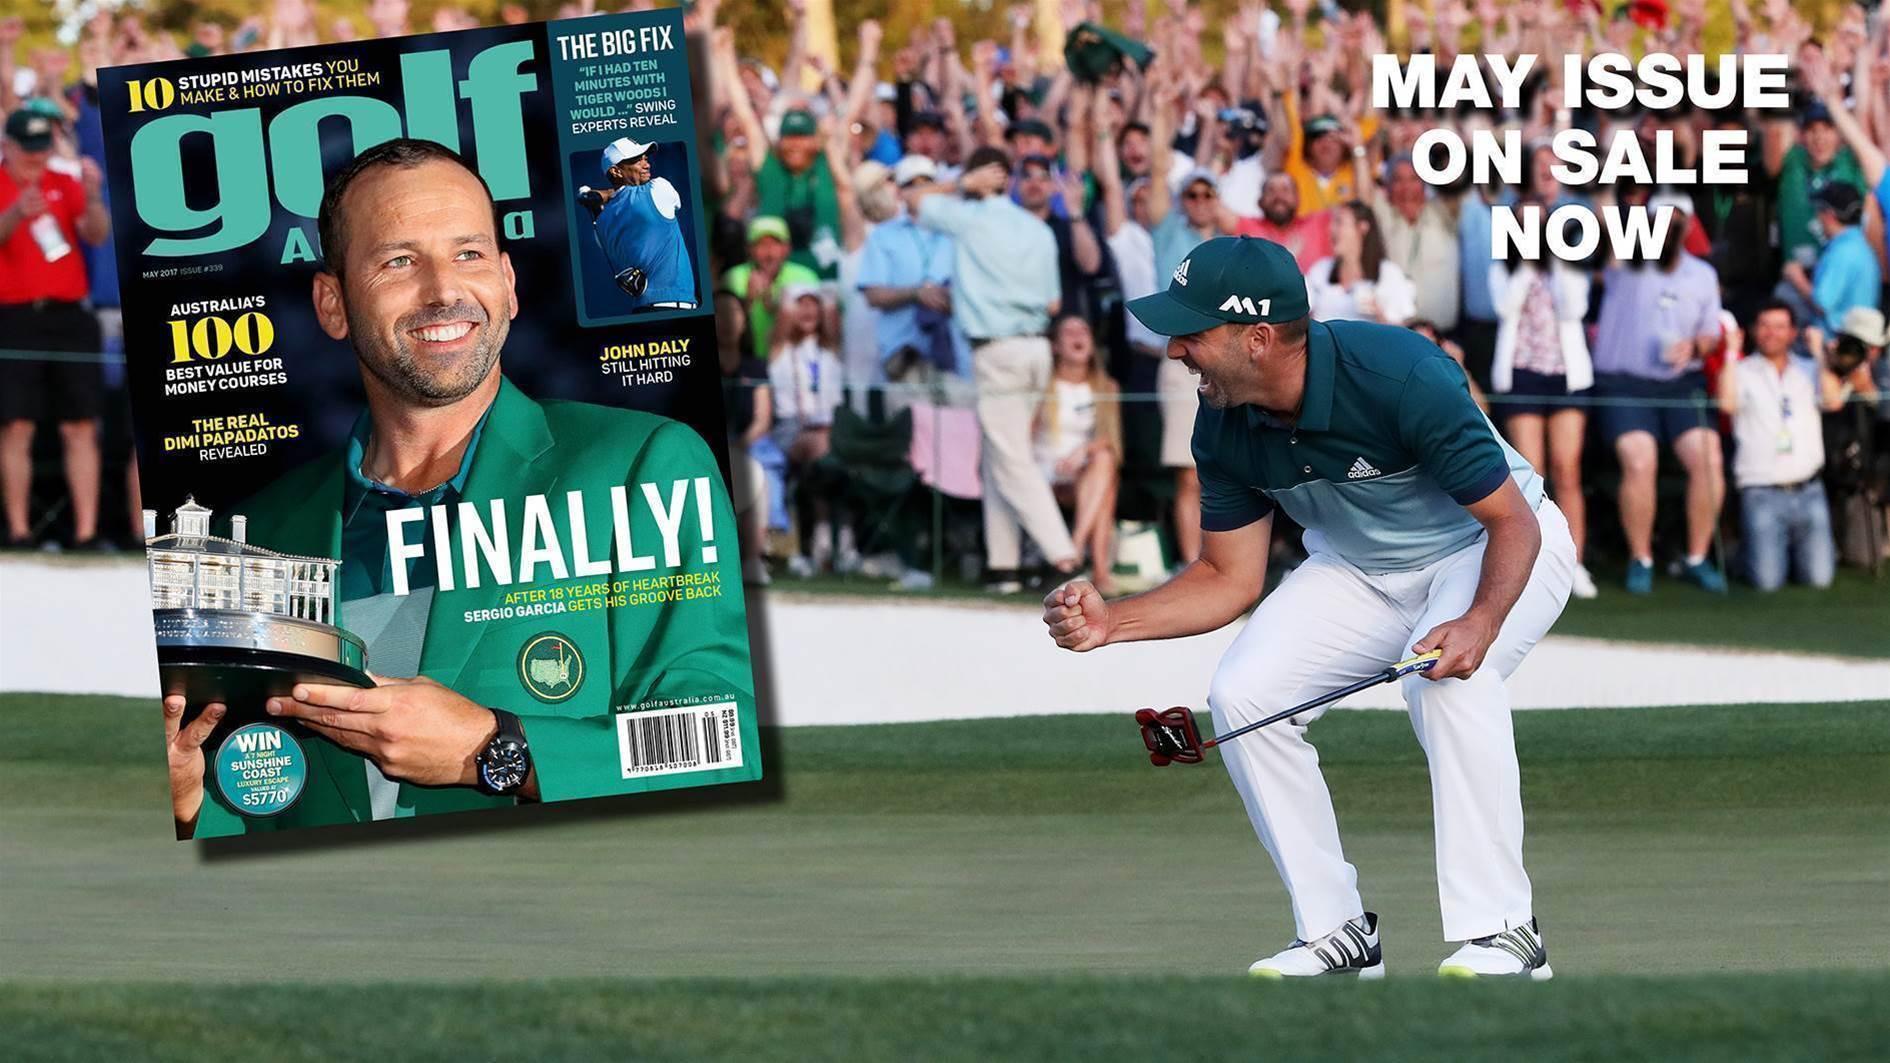 Inside: Golf Australia May 2017